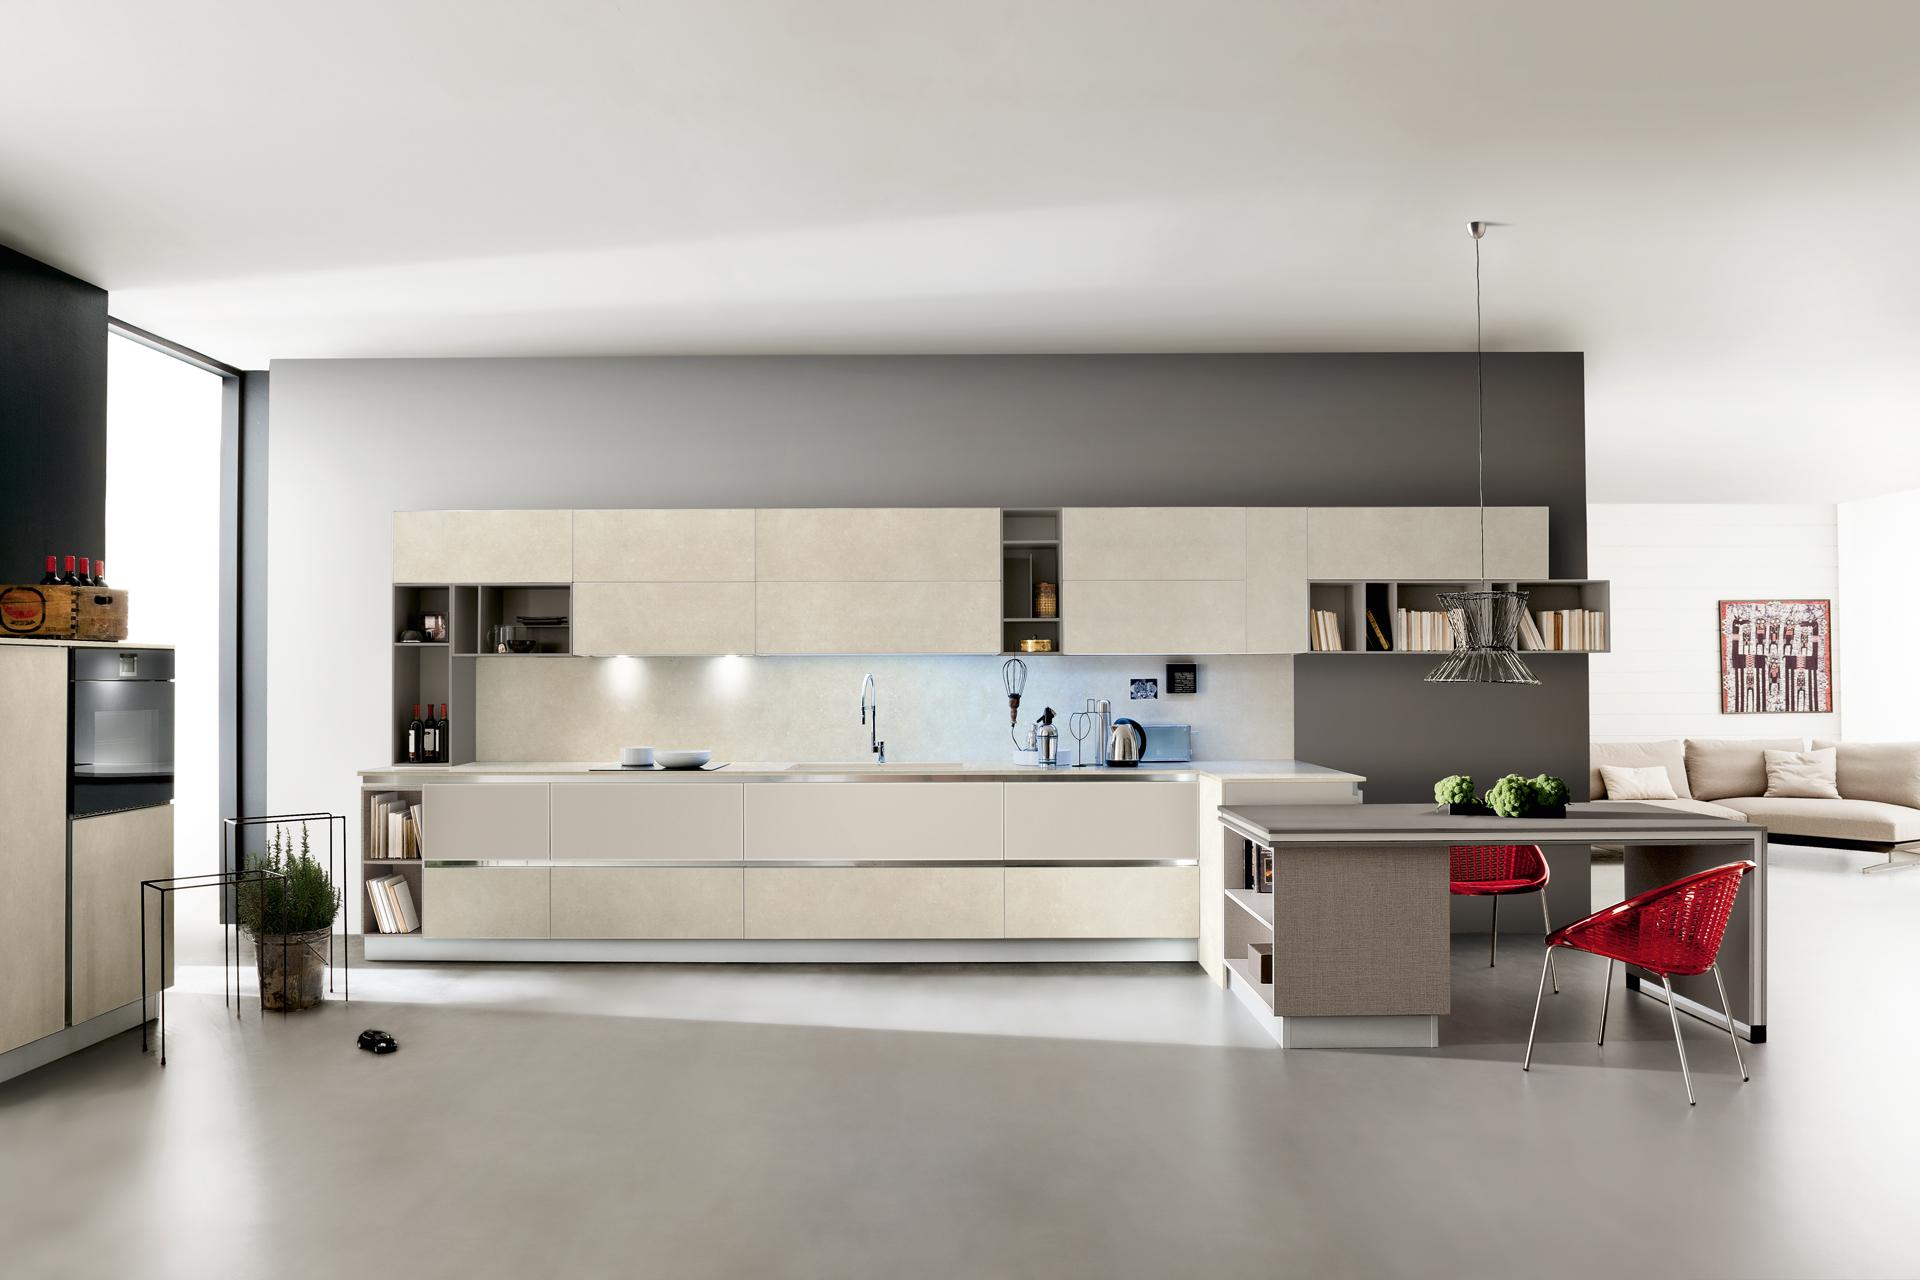 Arredamento Cucine Milano  Arredo Cucine di Alta Qualità